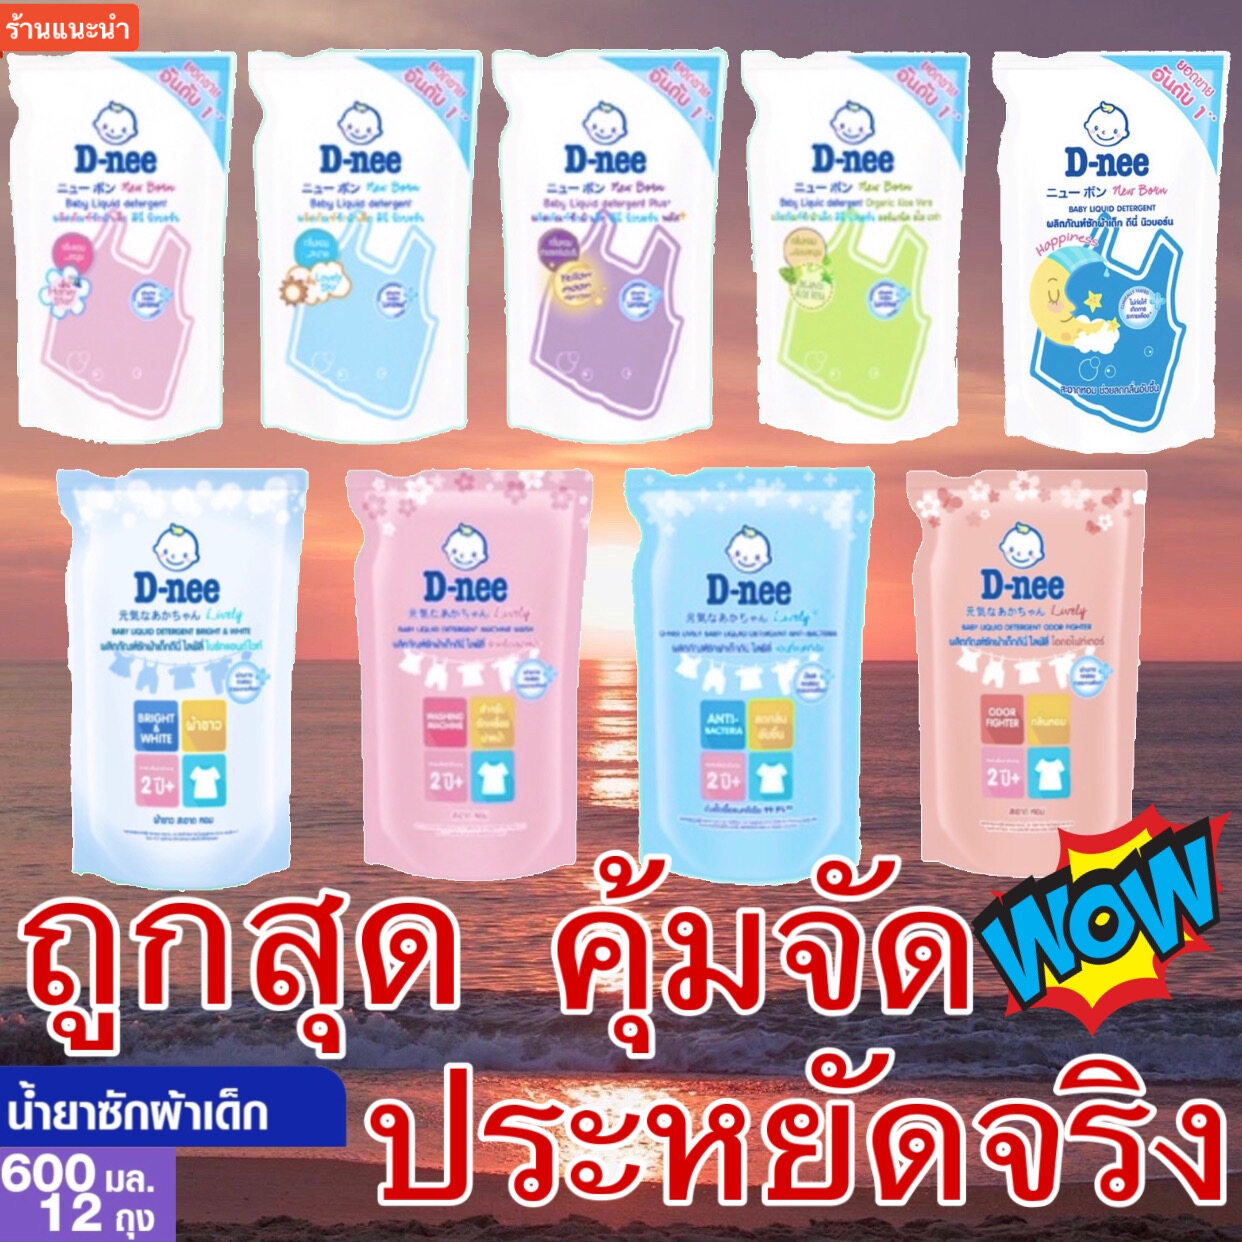 D-nee ดีนี่ น้ำยาซักผ้าเด็ก 600 มล. (ยกลัง 12 ถุง) (ขายยกลัง) (ขายยกลัง 12 ถุง) น้ำยาซักผ้าเด็กดีนี่ ยกลังคุ้มสุด ยกลัง